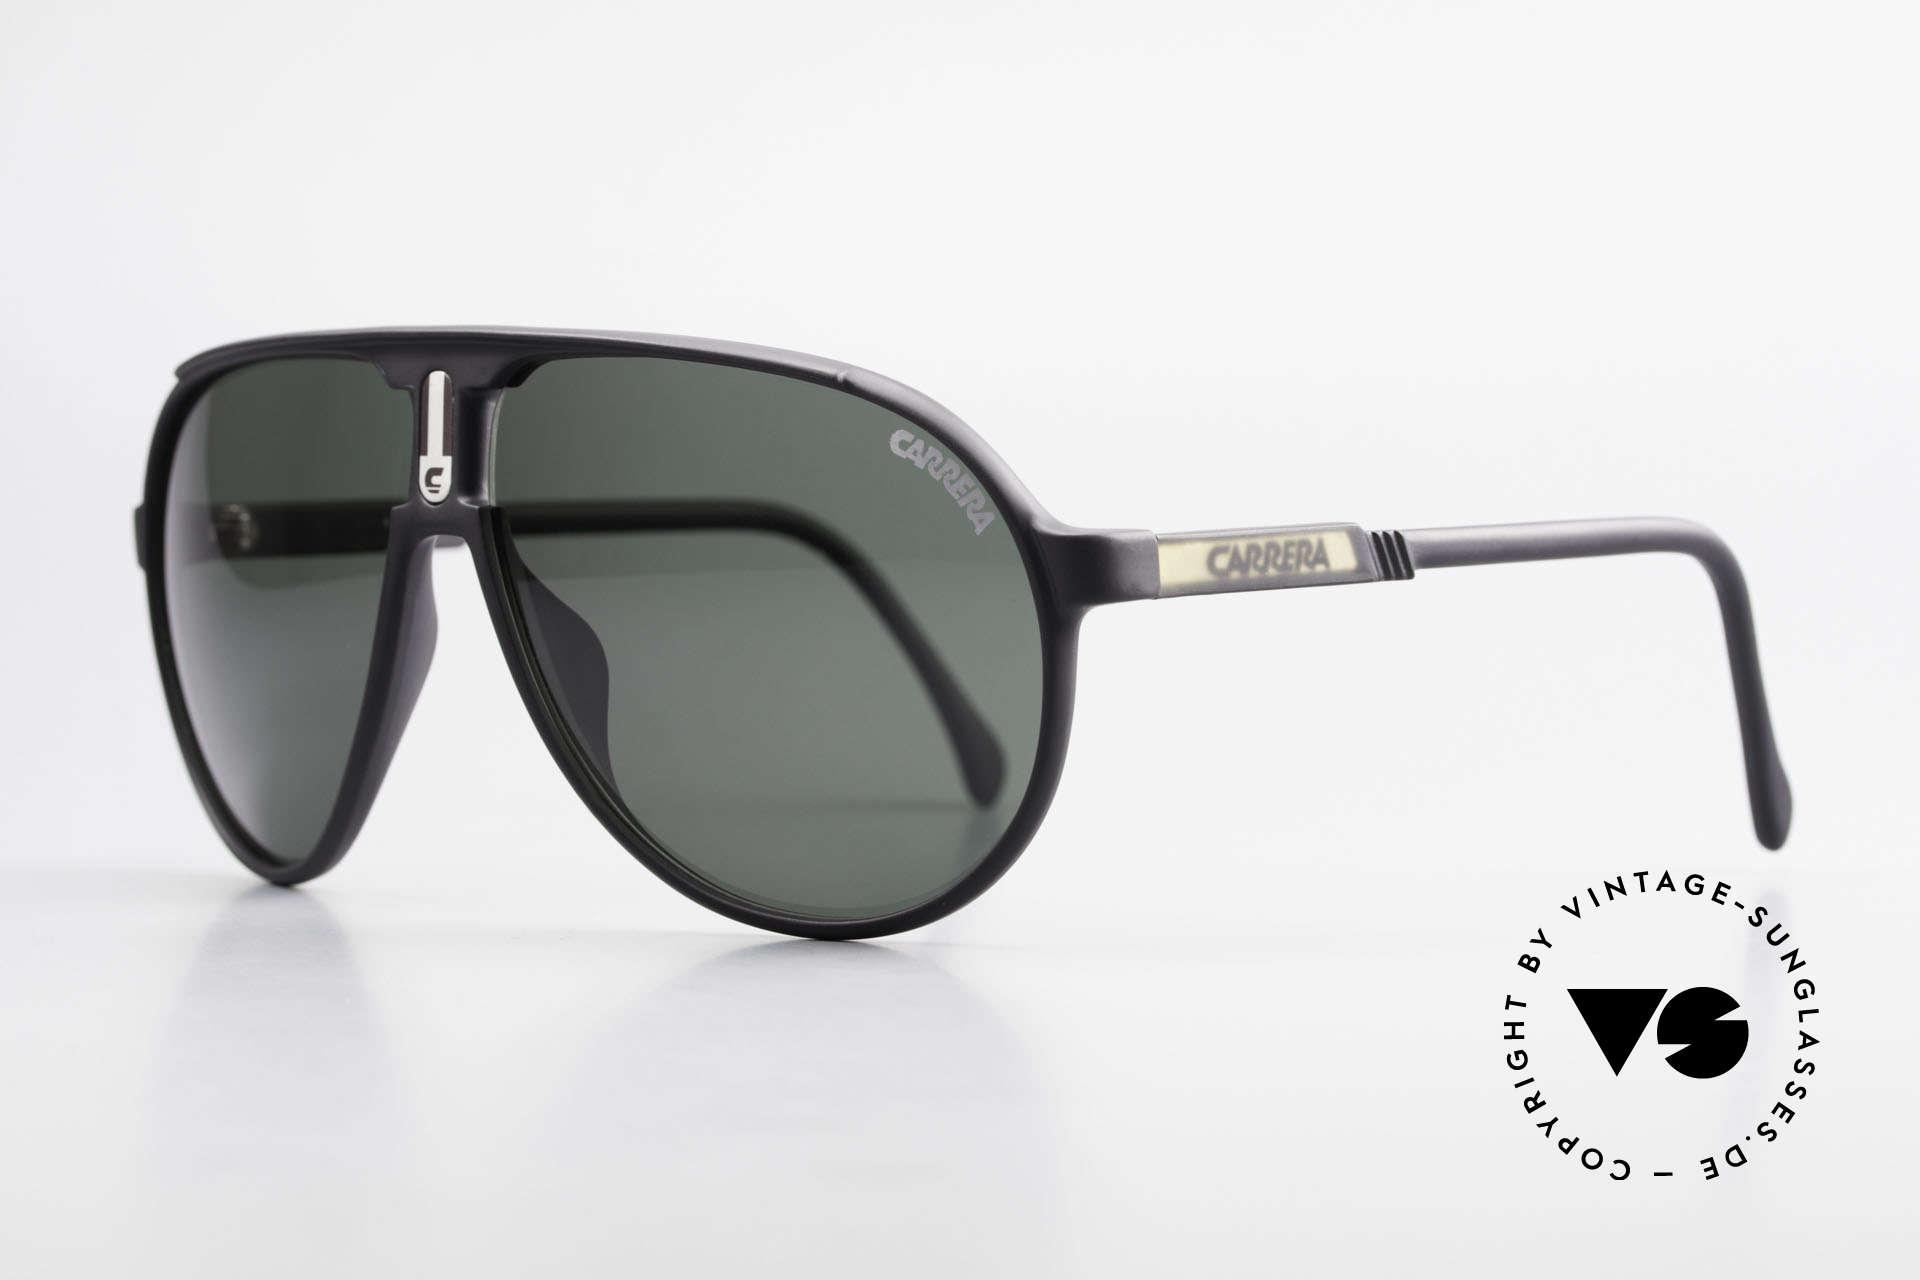 Carrera 5407 80's Sports Pilot's Sunglasses, sturdy, durable, lightweight plastic frame; Optyl, Made for Men